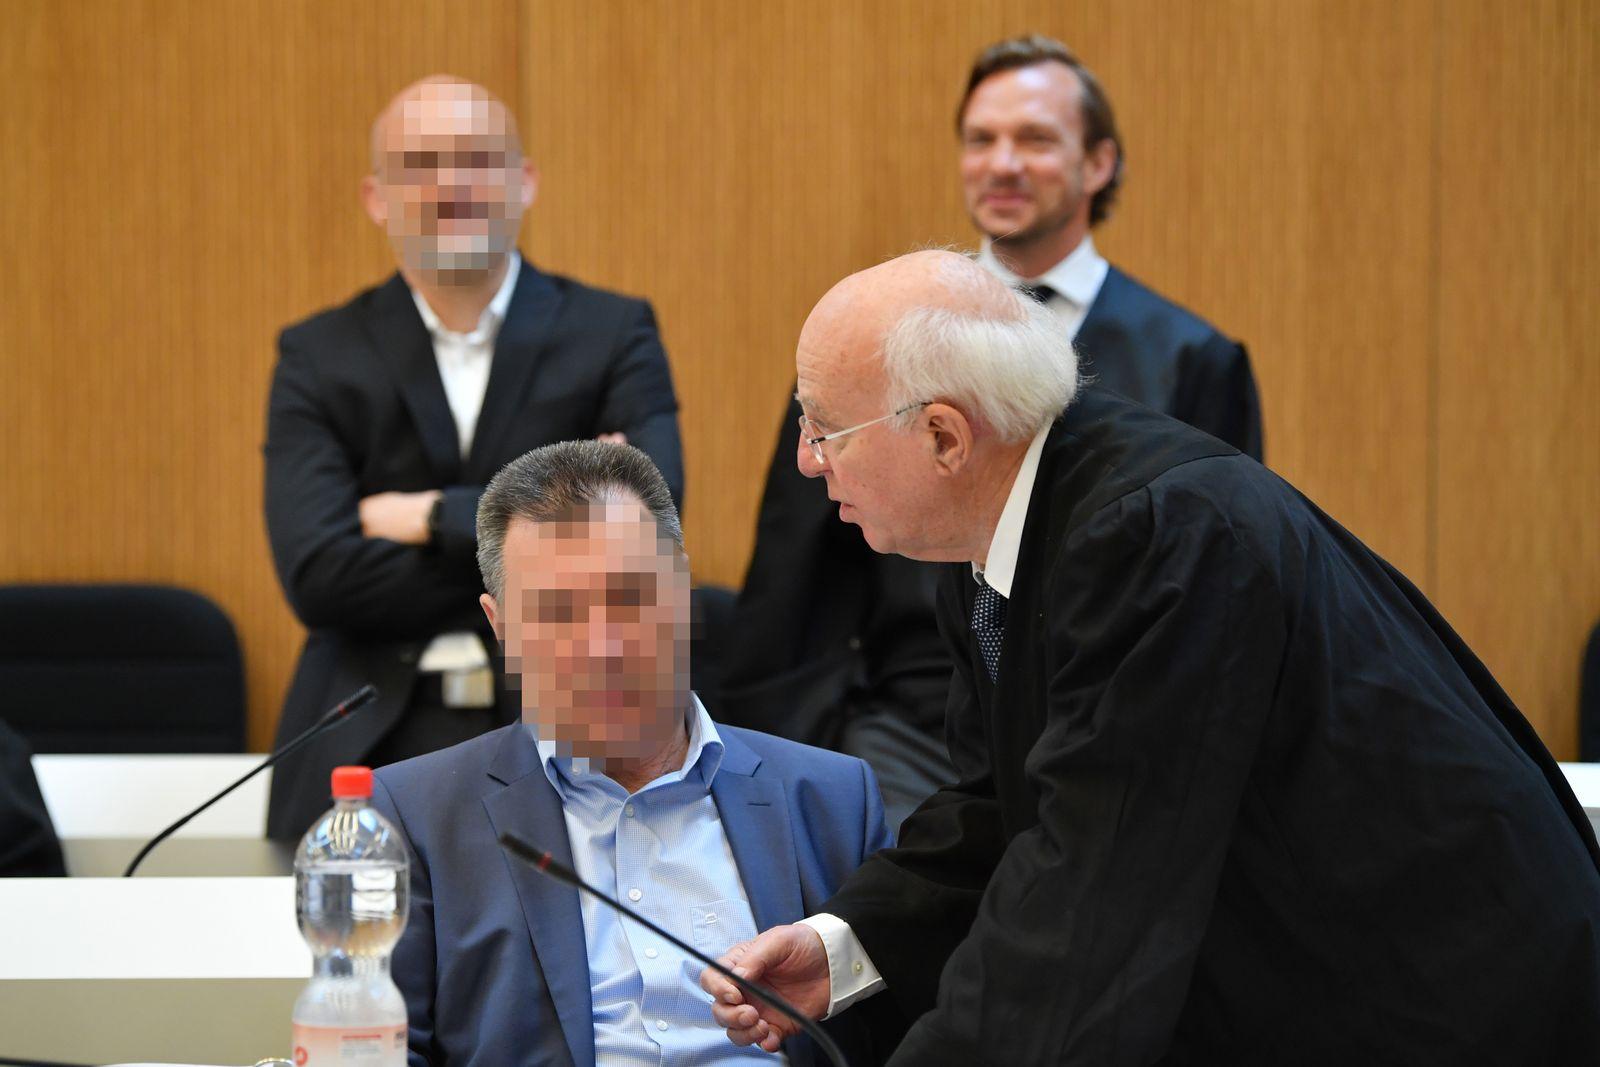 Rupert Stadler, Former Audi Head, Goes In Trial In Munich